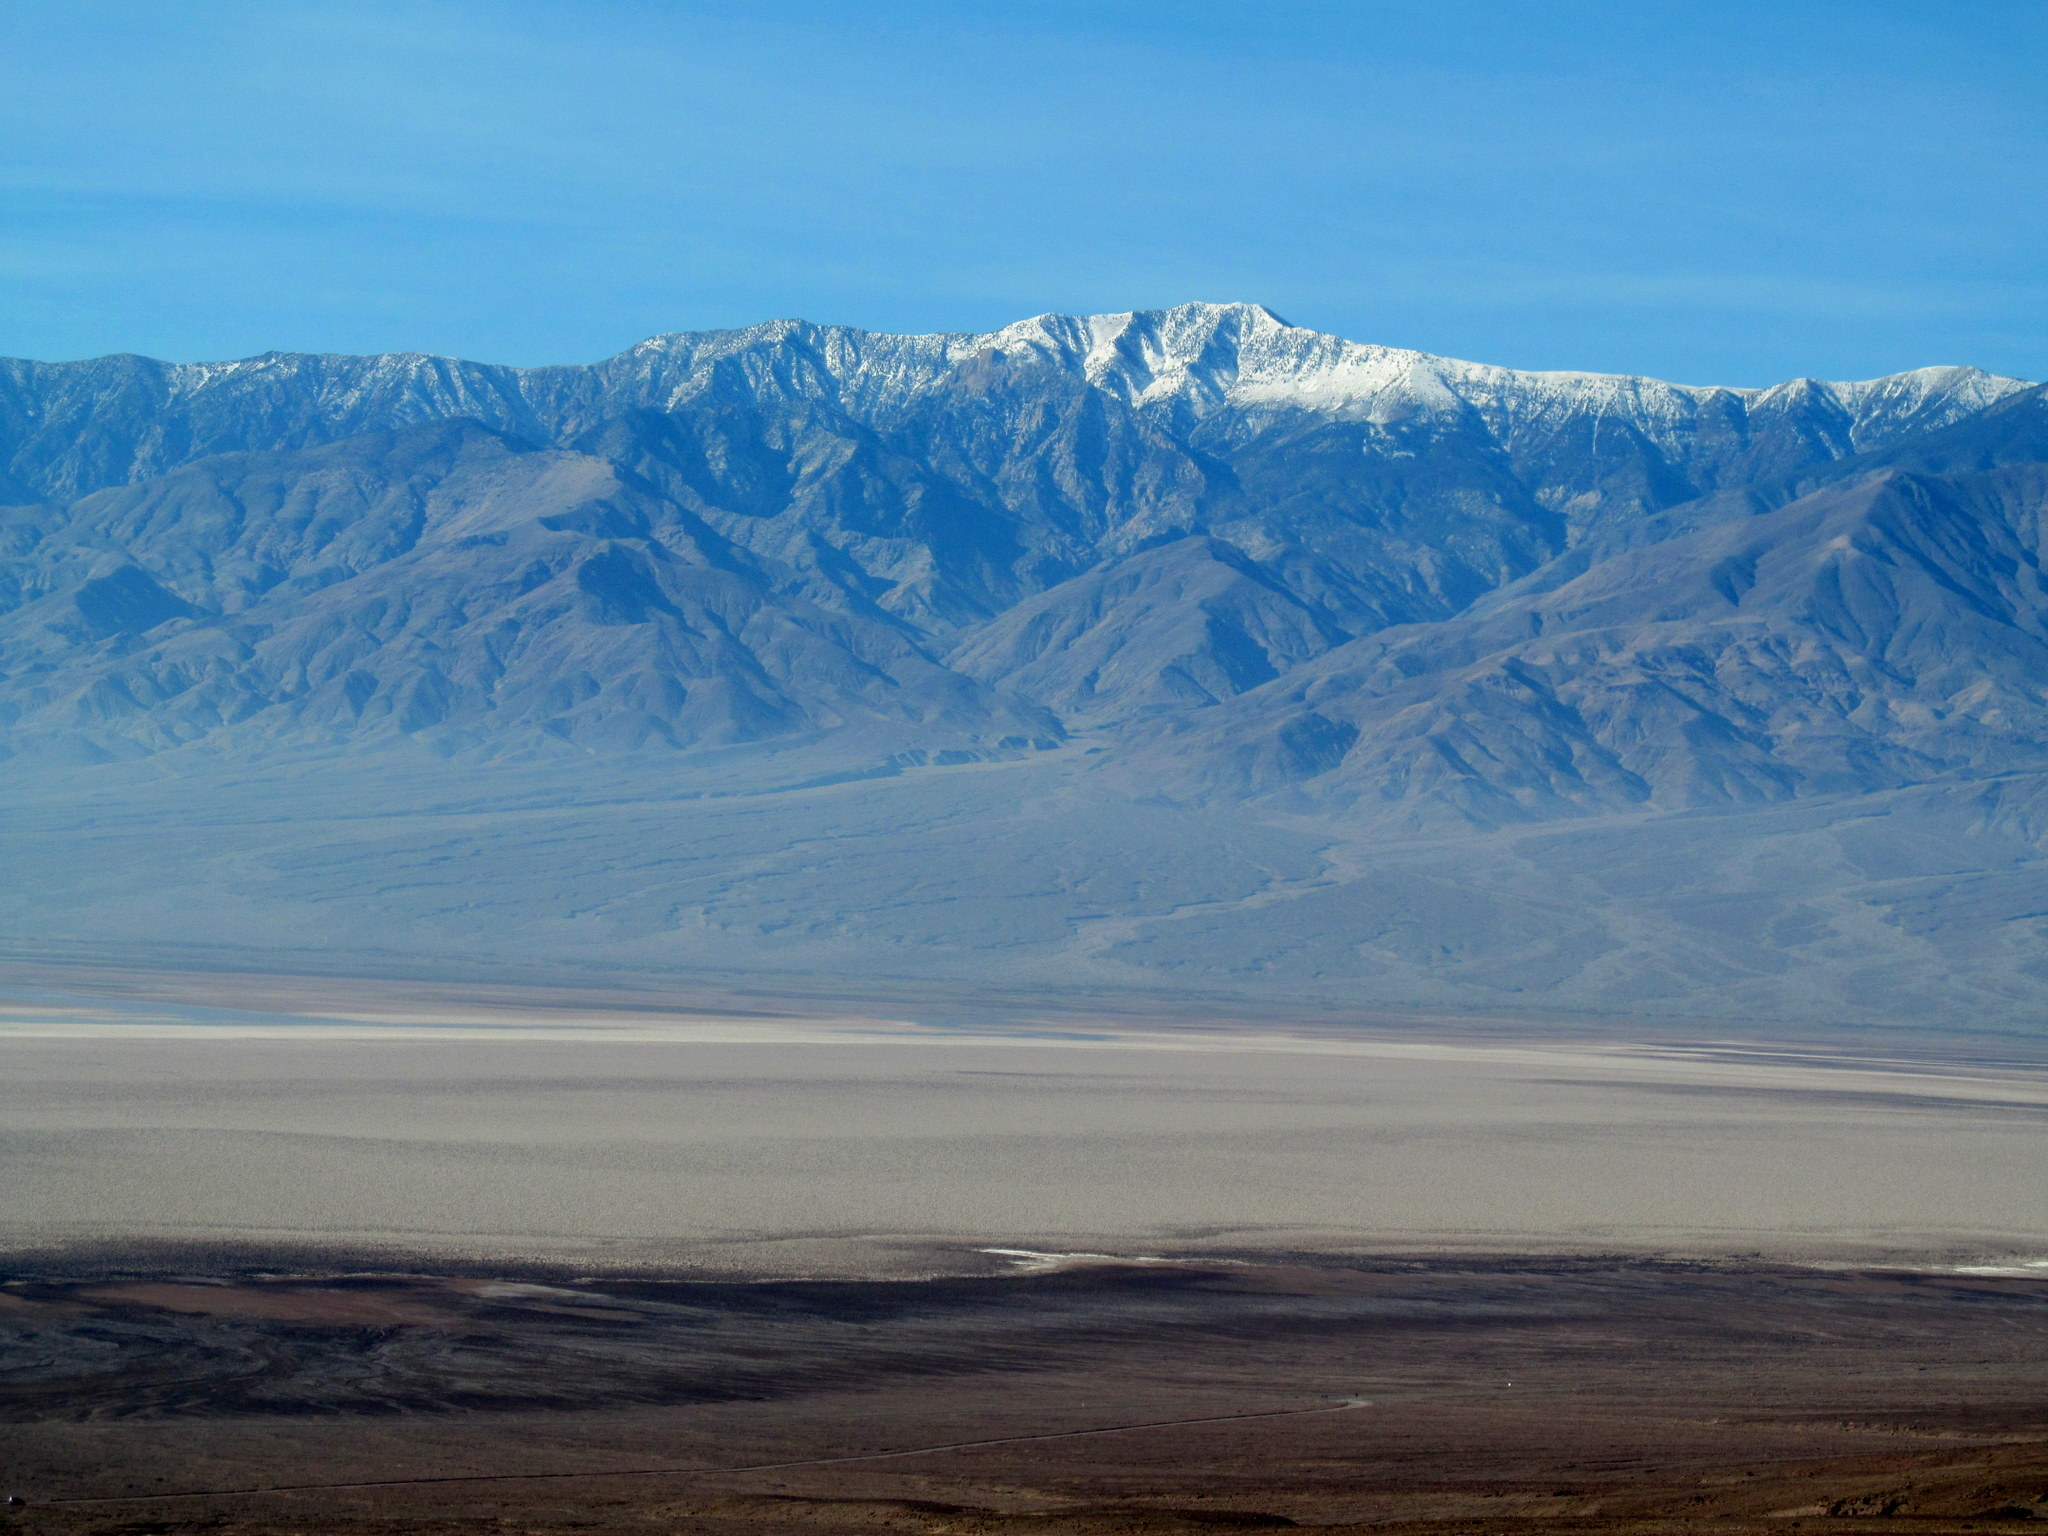 Photo: Telescope Peak, highest point in Death Valley National Park